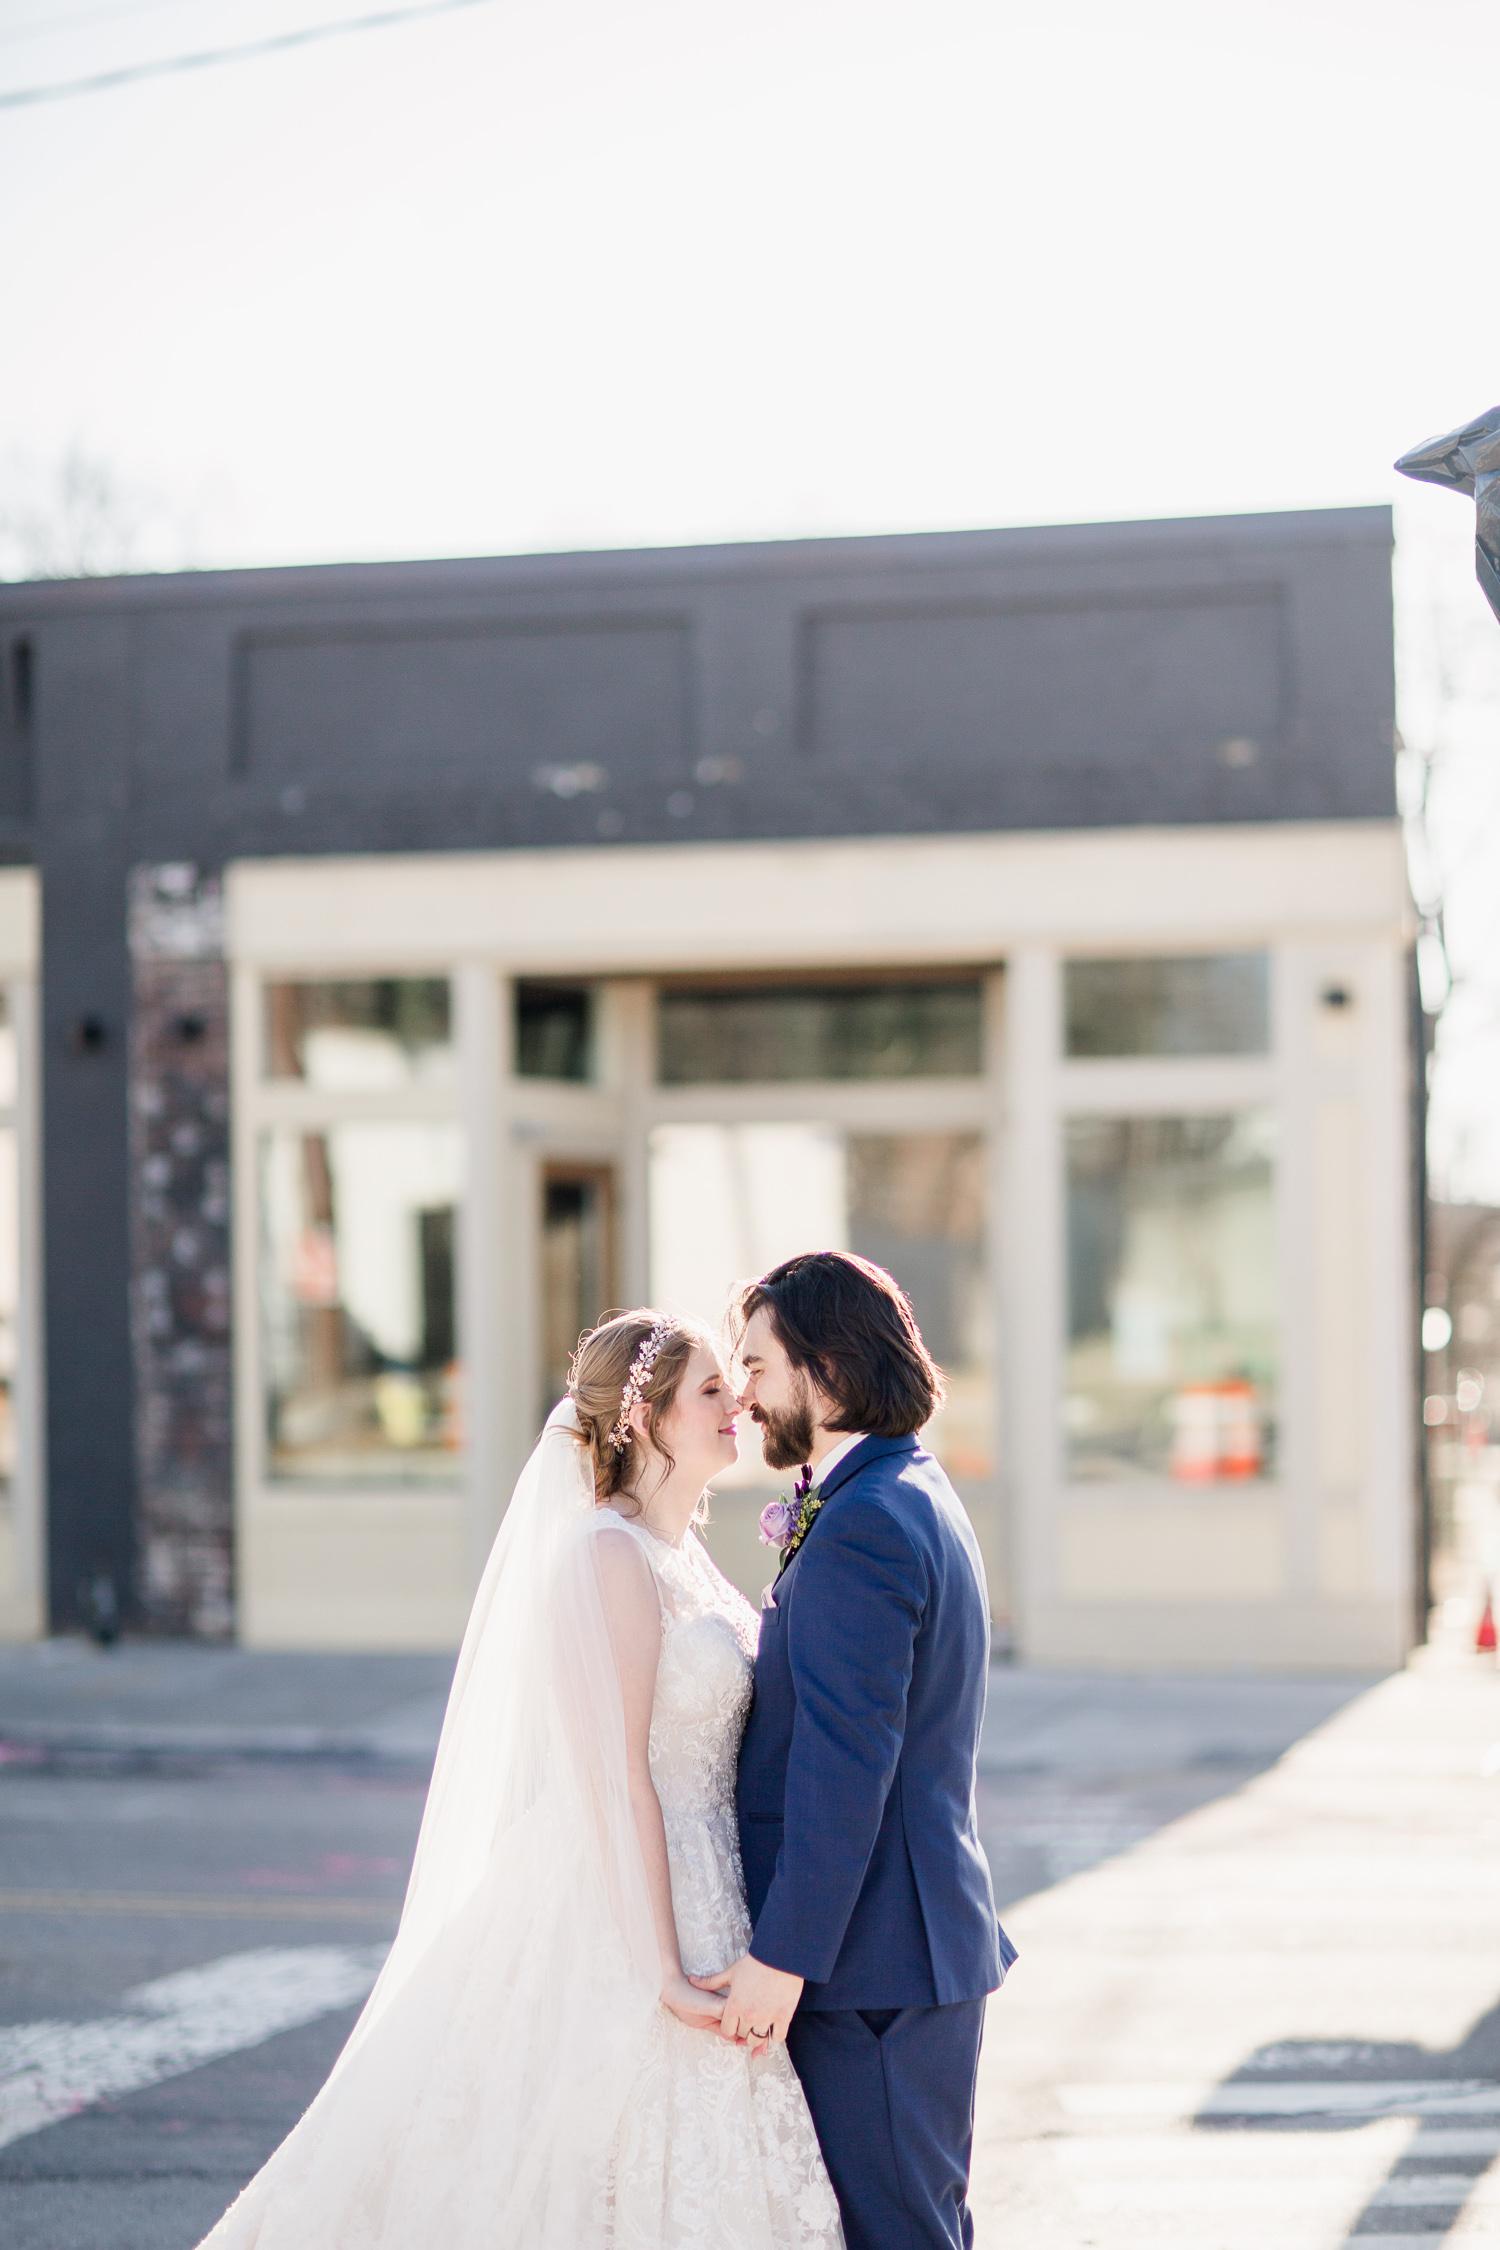 Downtown Knoxville Wedding Venue // Central Avenue Reception // Bridesmaids // Bride & Groom Portraits